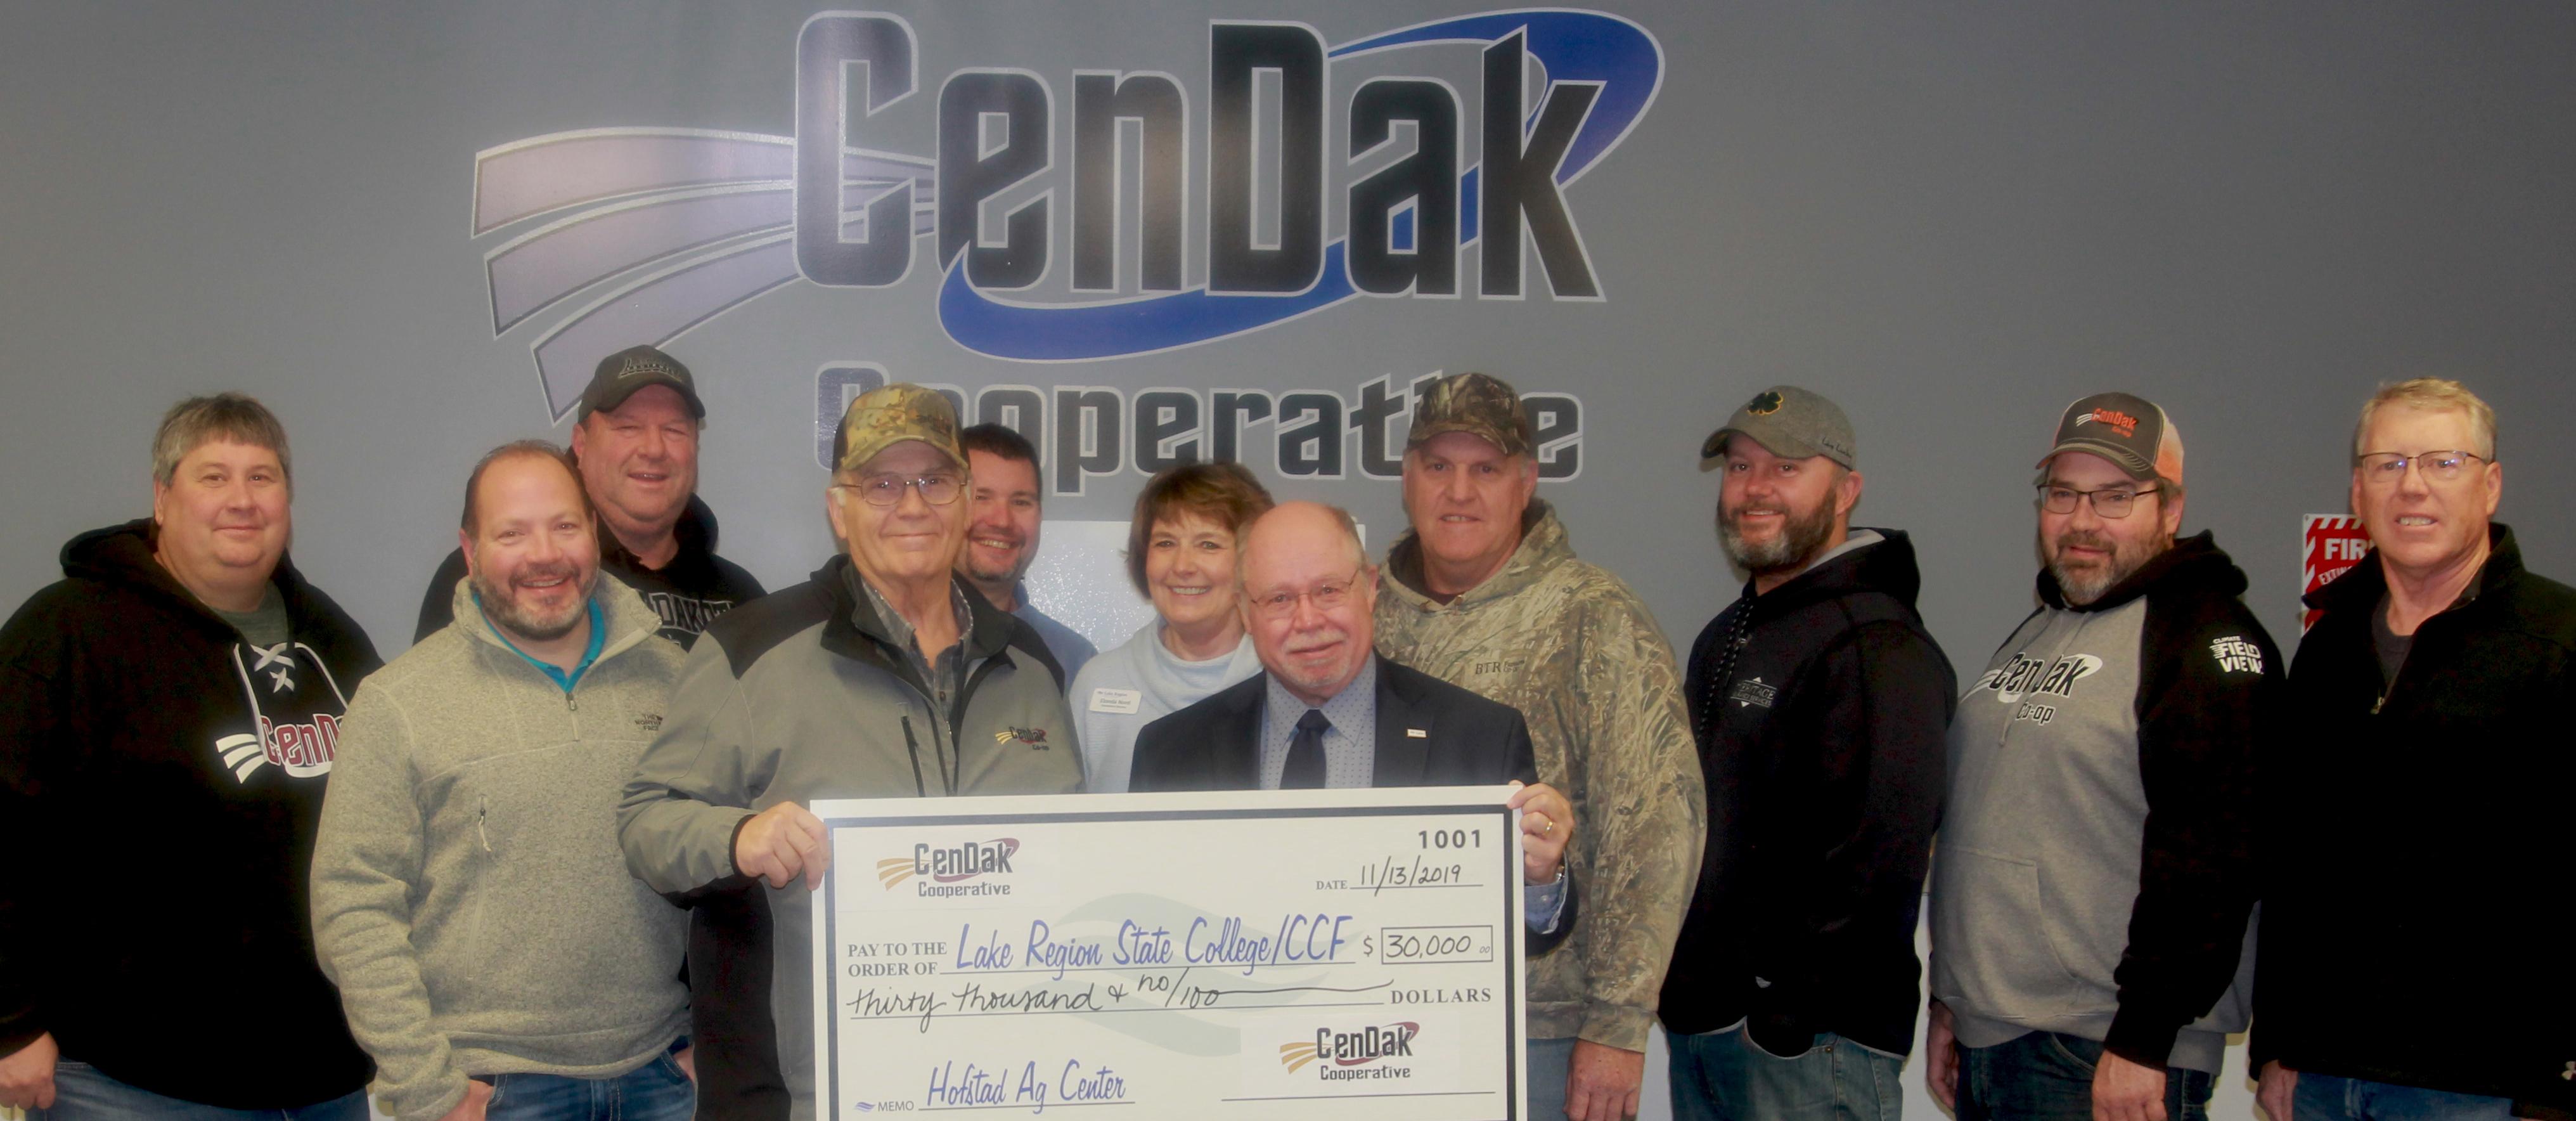 Members of CenDak Board, management, and LRSC representatives